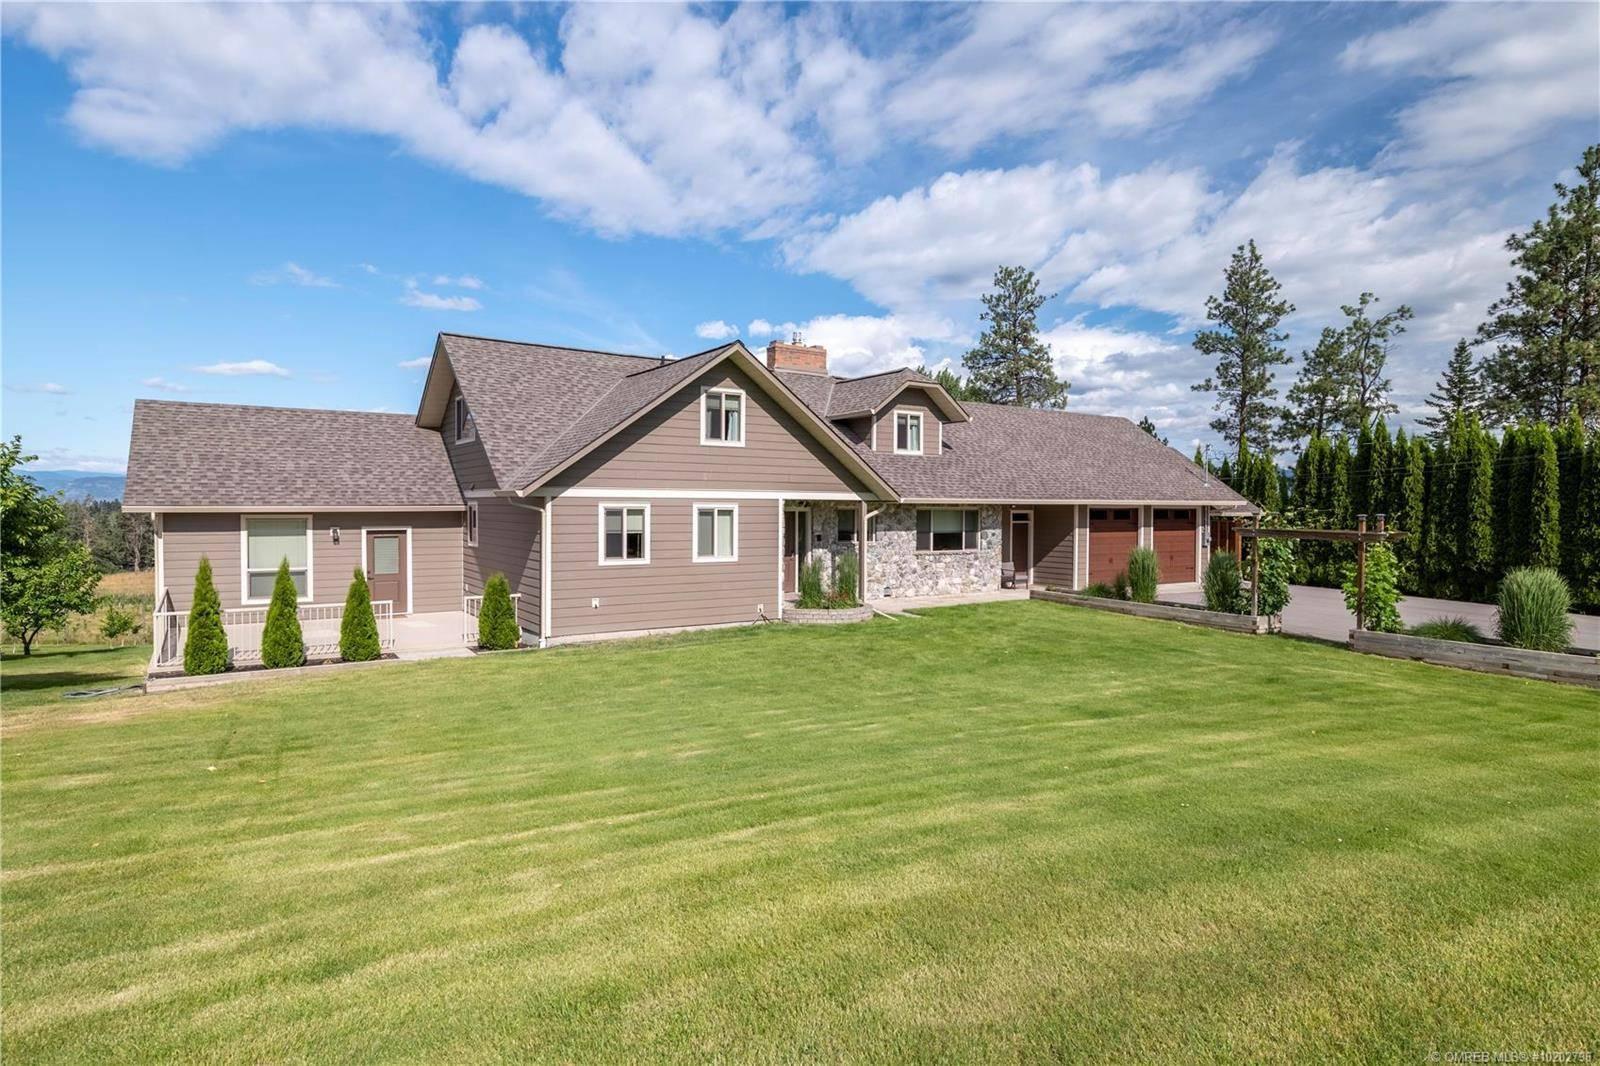 House for sale at 4112 Lemky Rd Kelowna British Columbia - MLS: 10202796